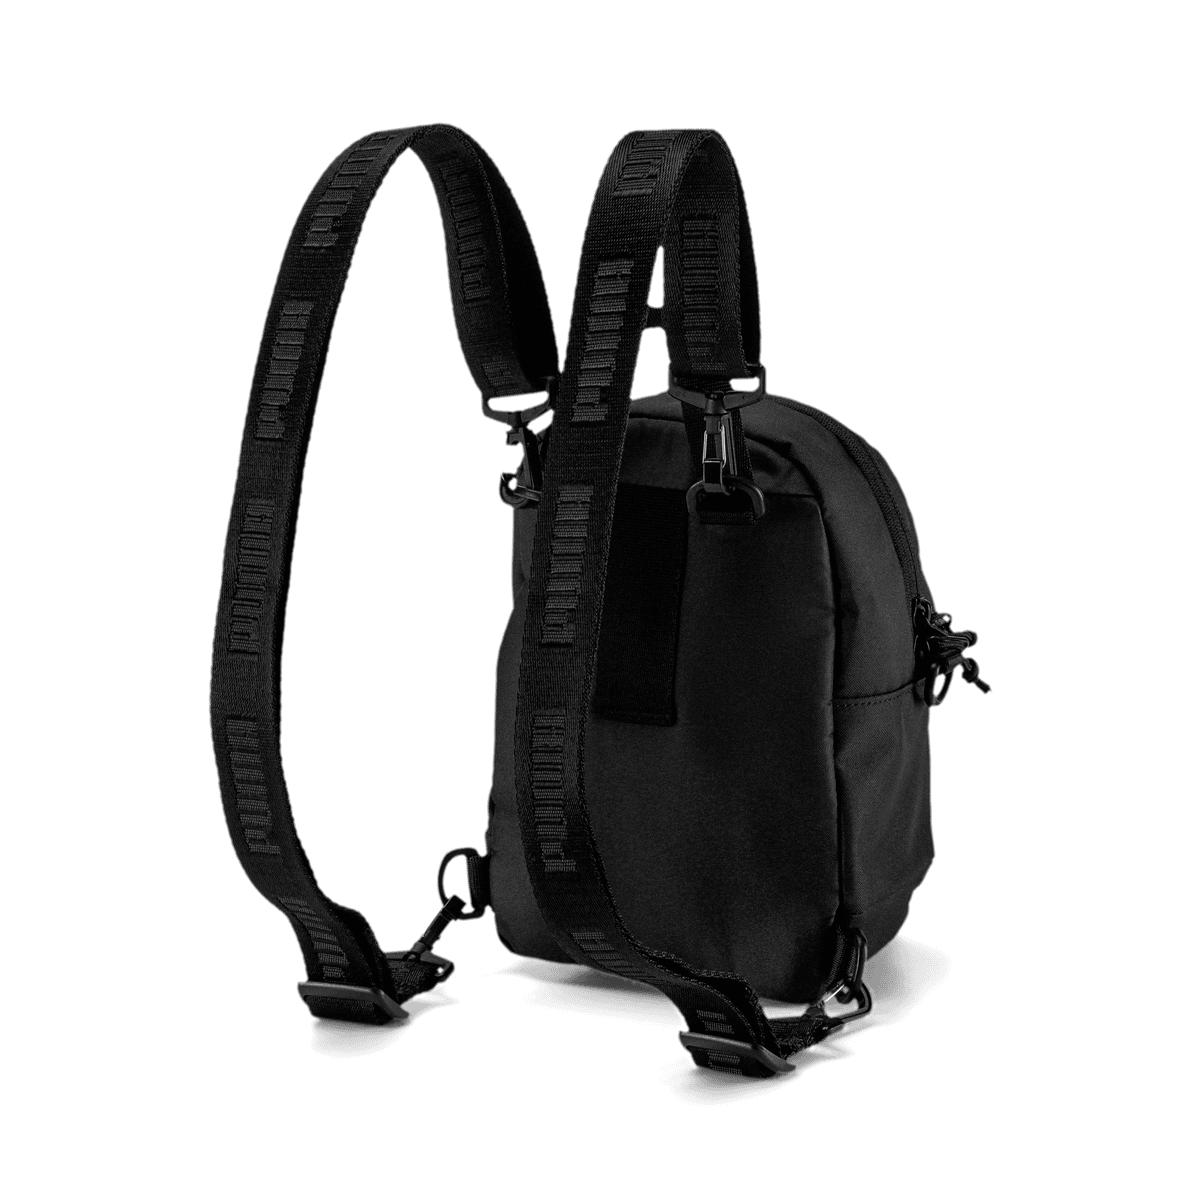 Puma Damen Rucksack Core Minime Backpack schwarzweiß